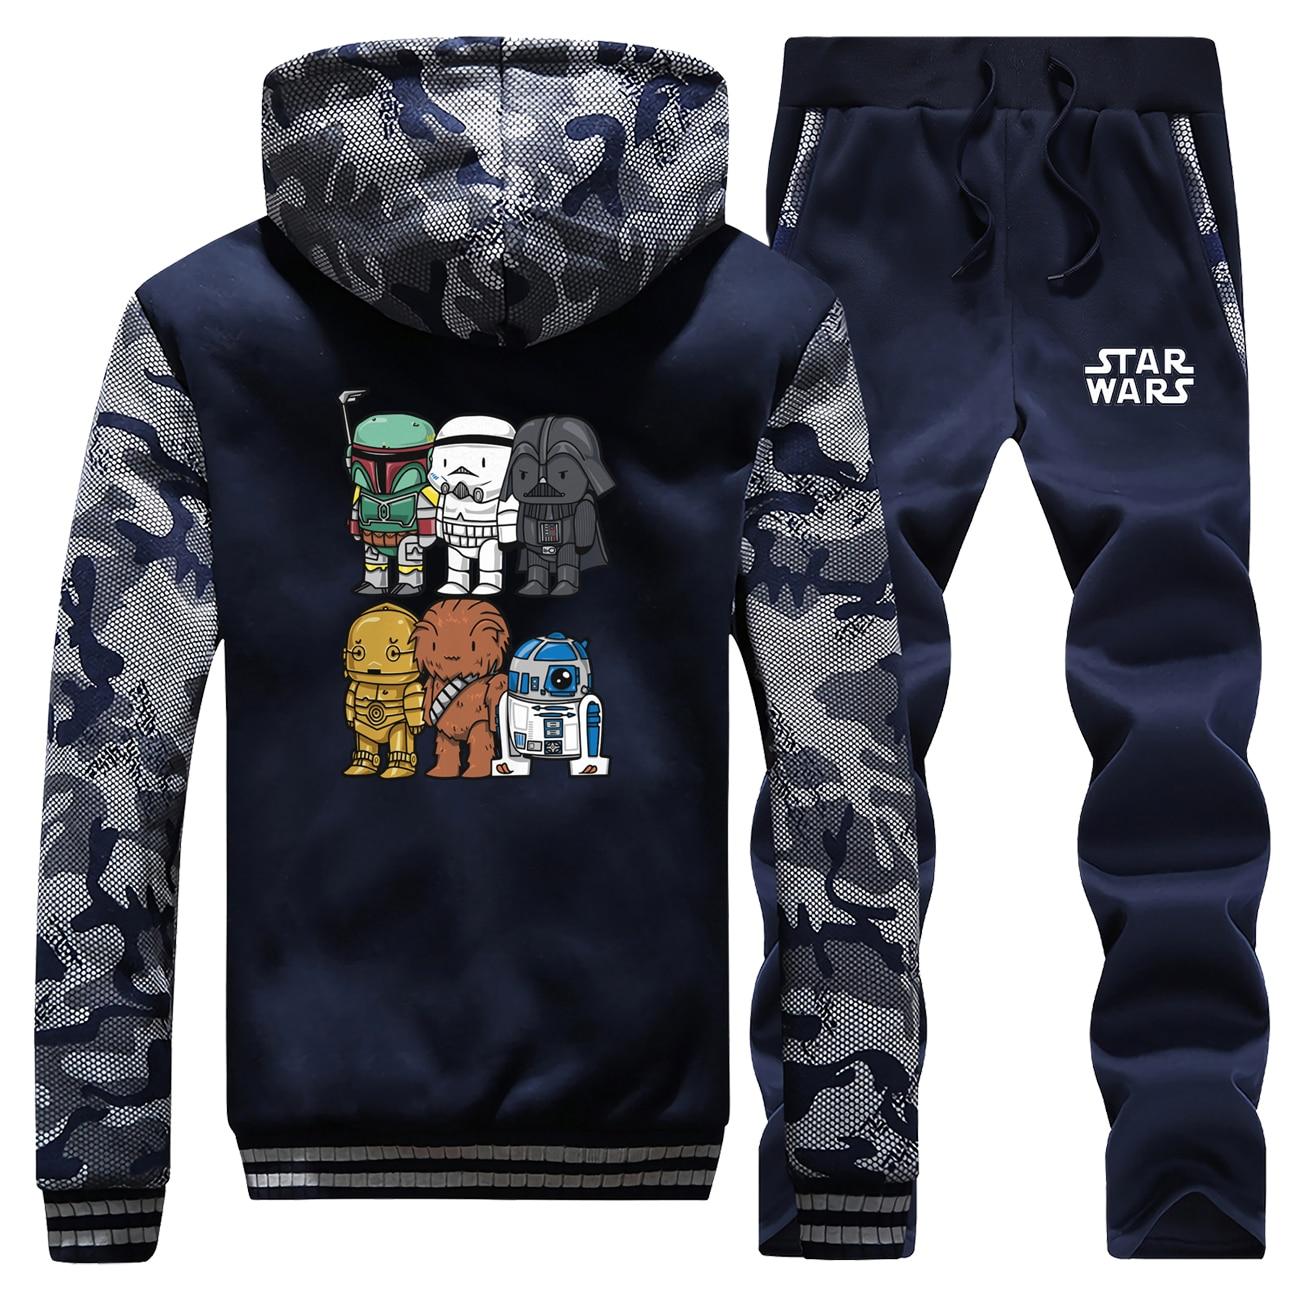 Fashion Jedi Knights Star Wars Darth Vader Camo Hoodies Sweatshirts Pants Sets Mens Winter Casual Fleece Sportswear Sweatshirt